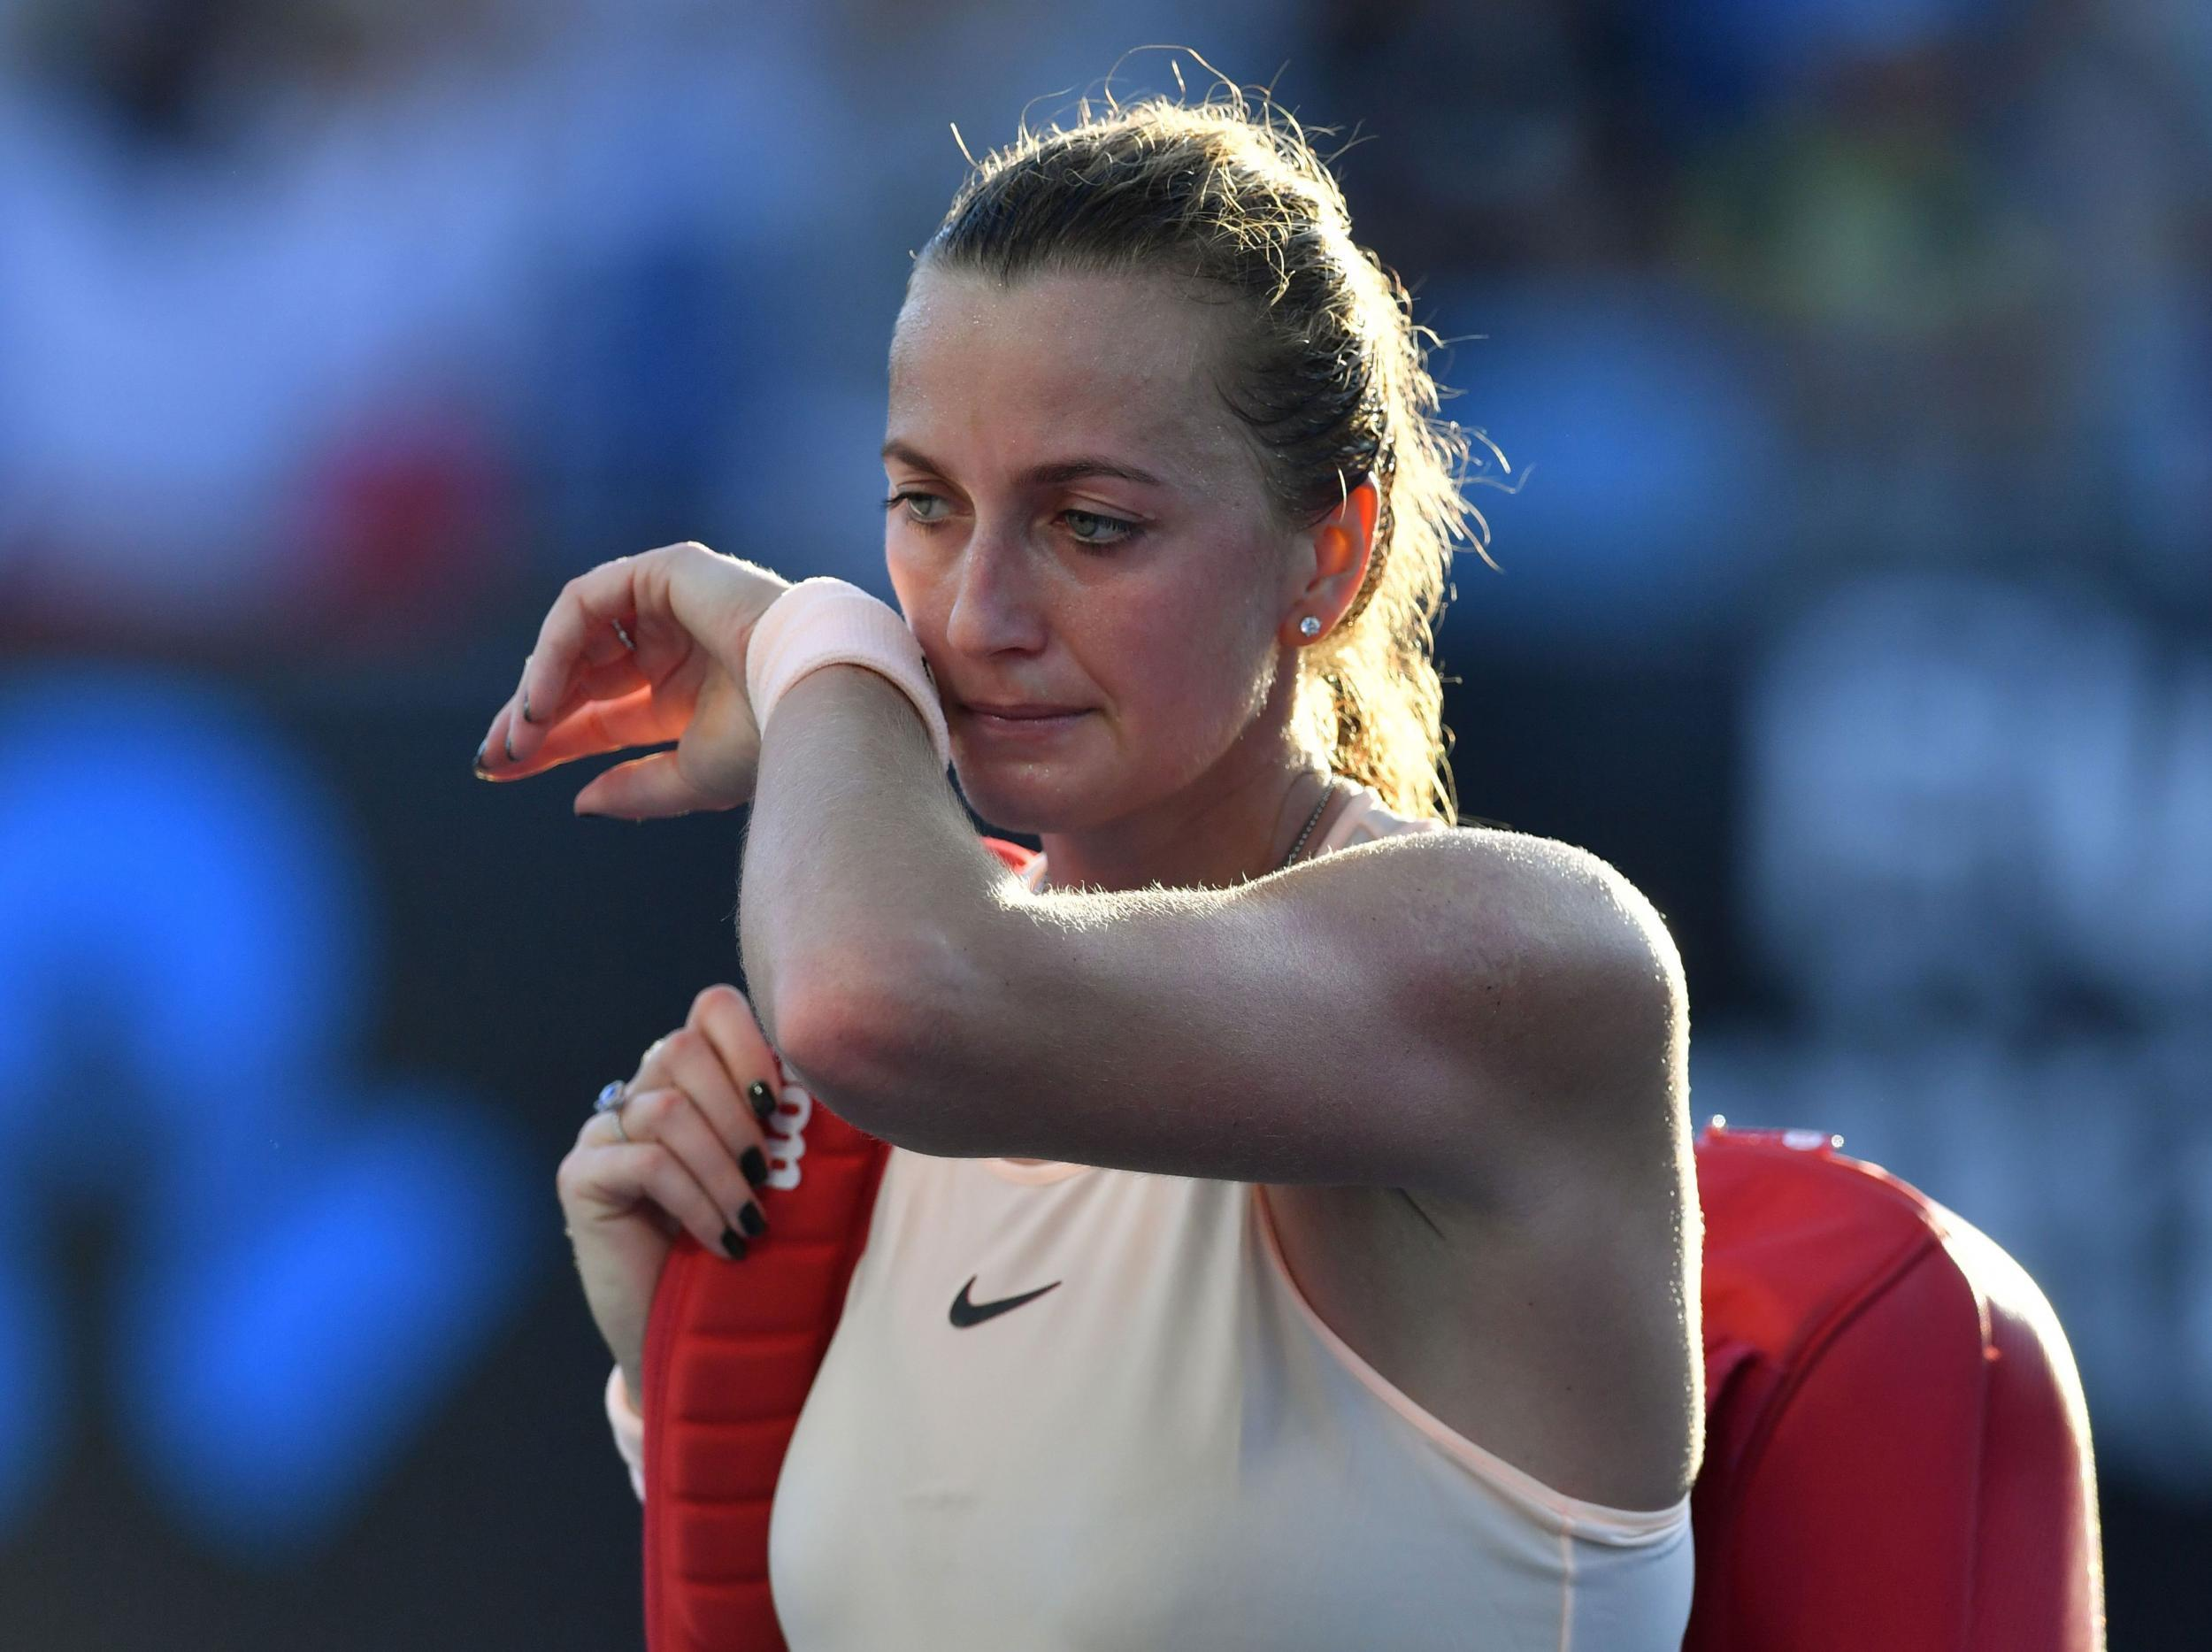 Australian Open  Petra Kvitova Out But Maria Sharapova Cruises Through The Independent